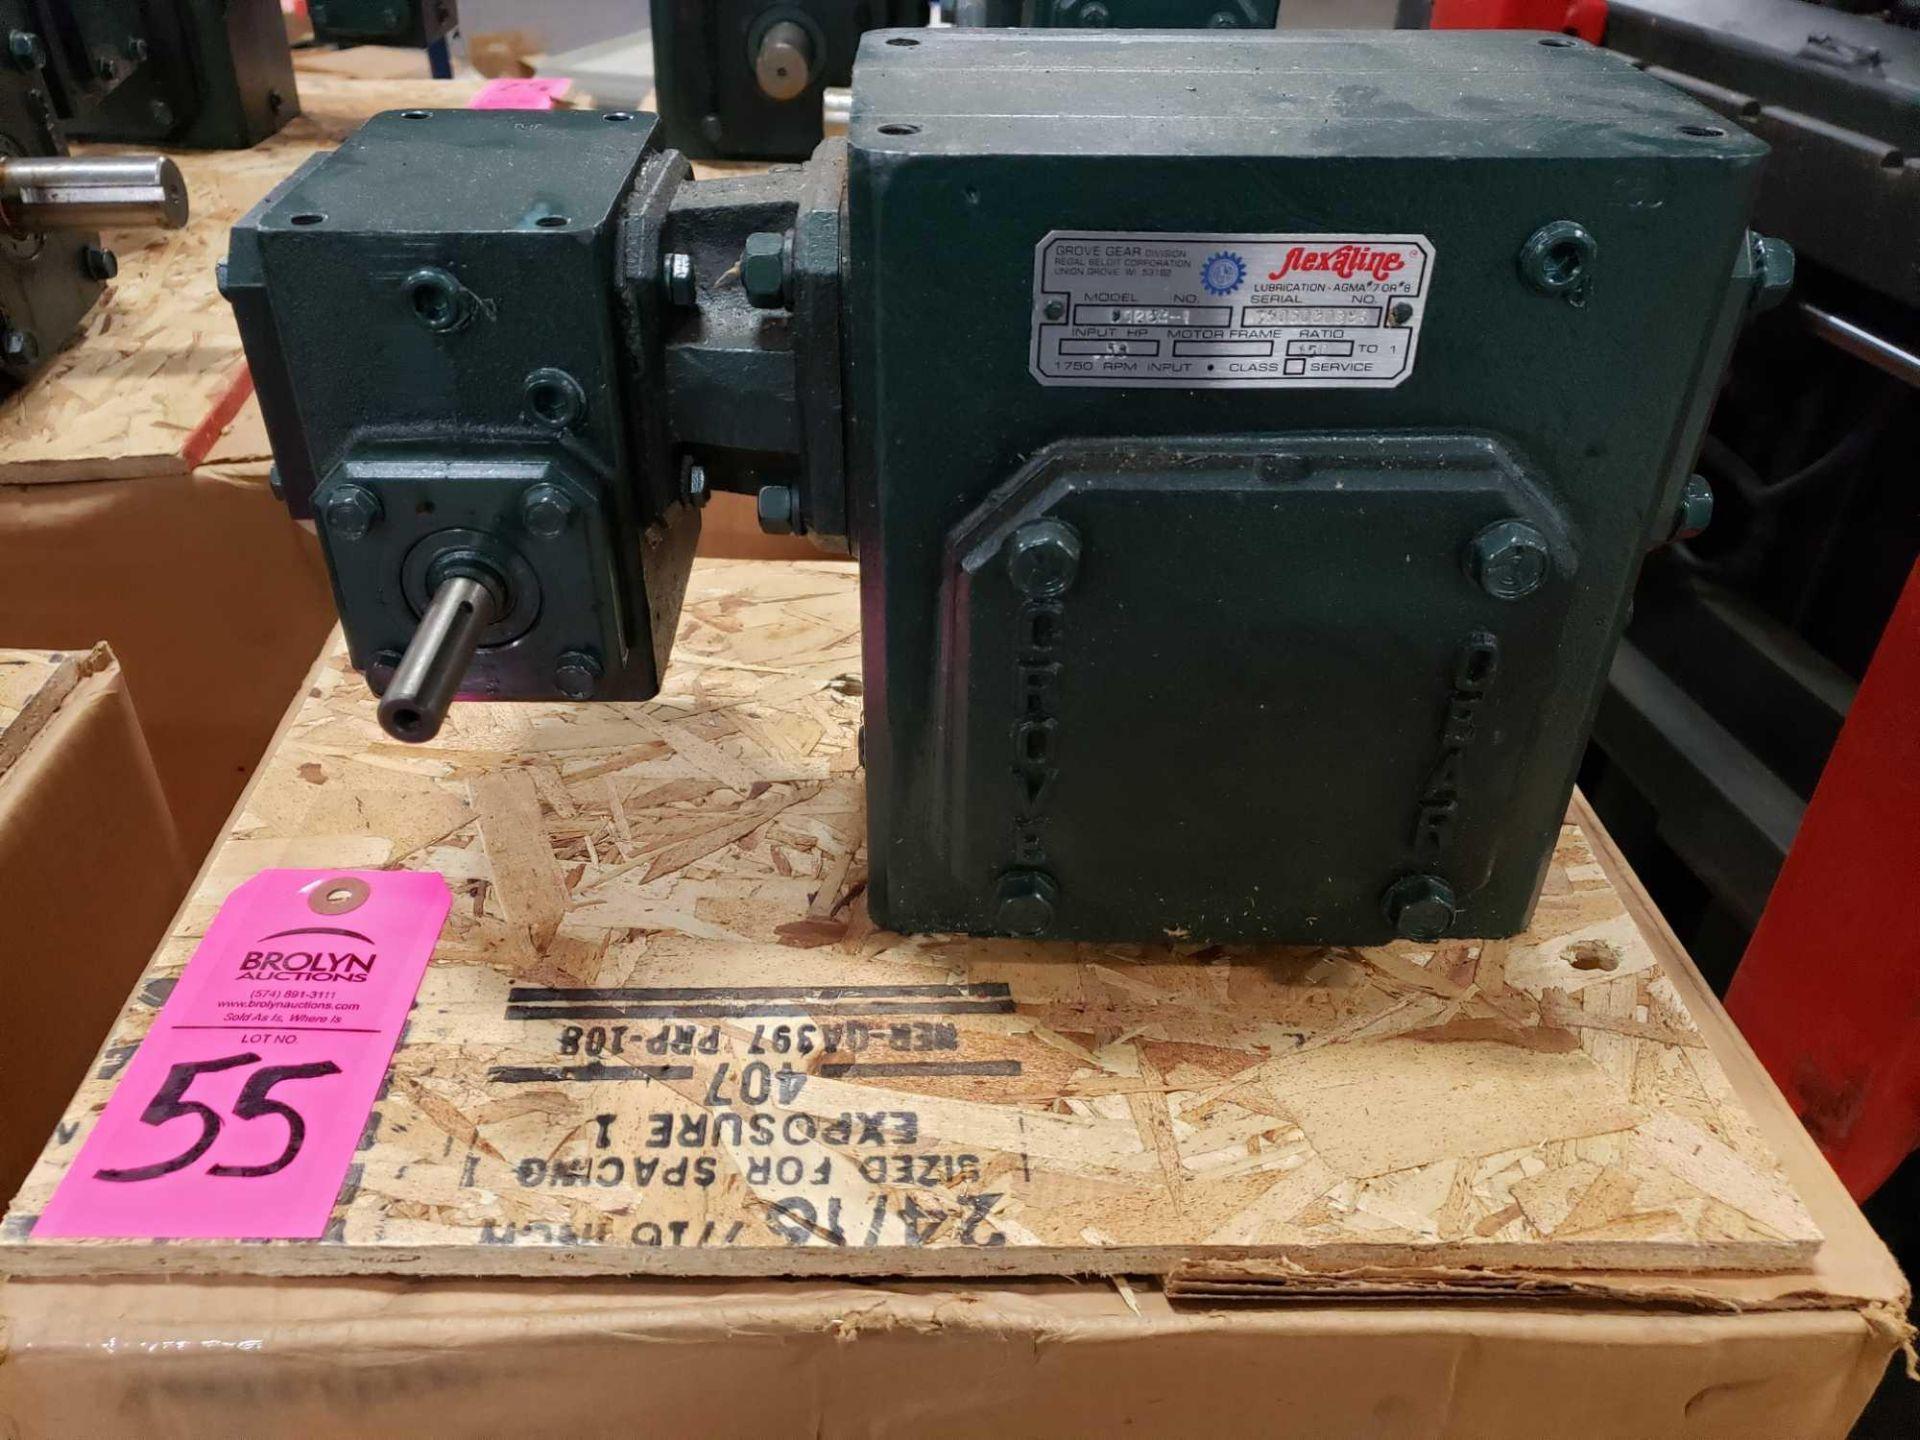 Lot 55 - Grove Gear Flexaline gearbox worm gear speed reducer model D1262-1, ratio 150:1. New in box.